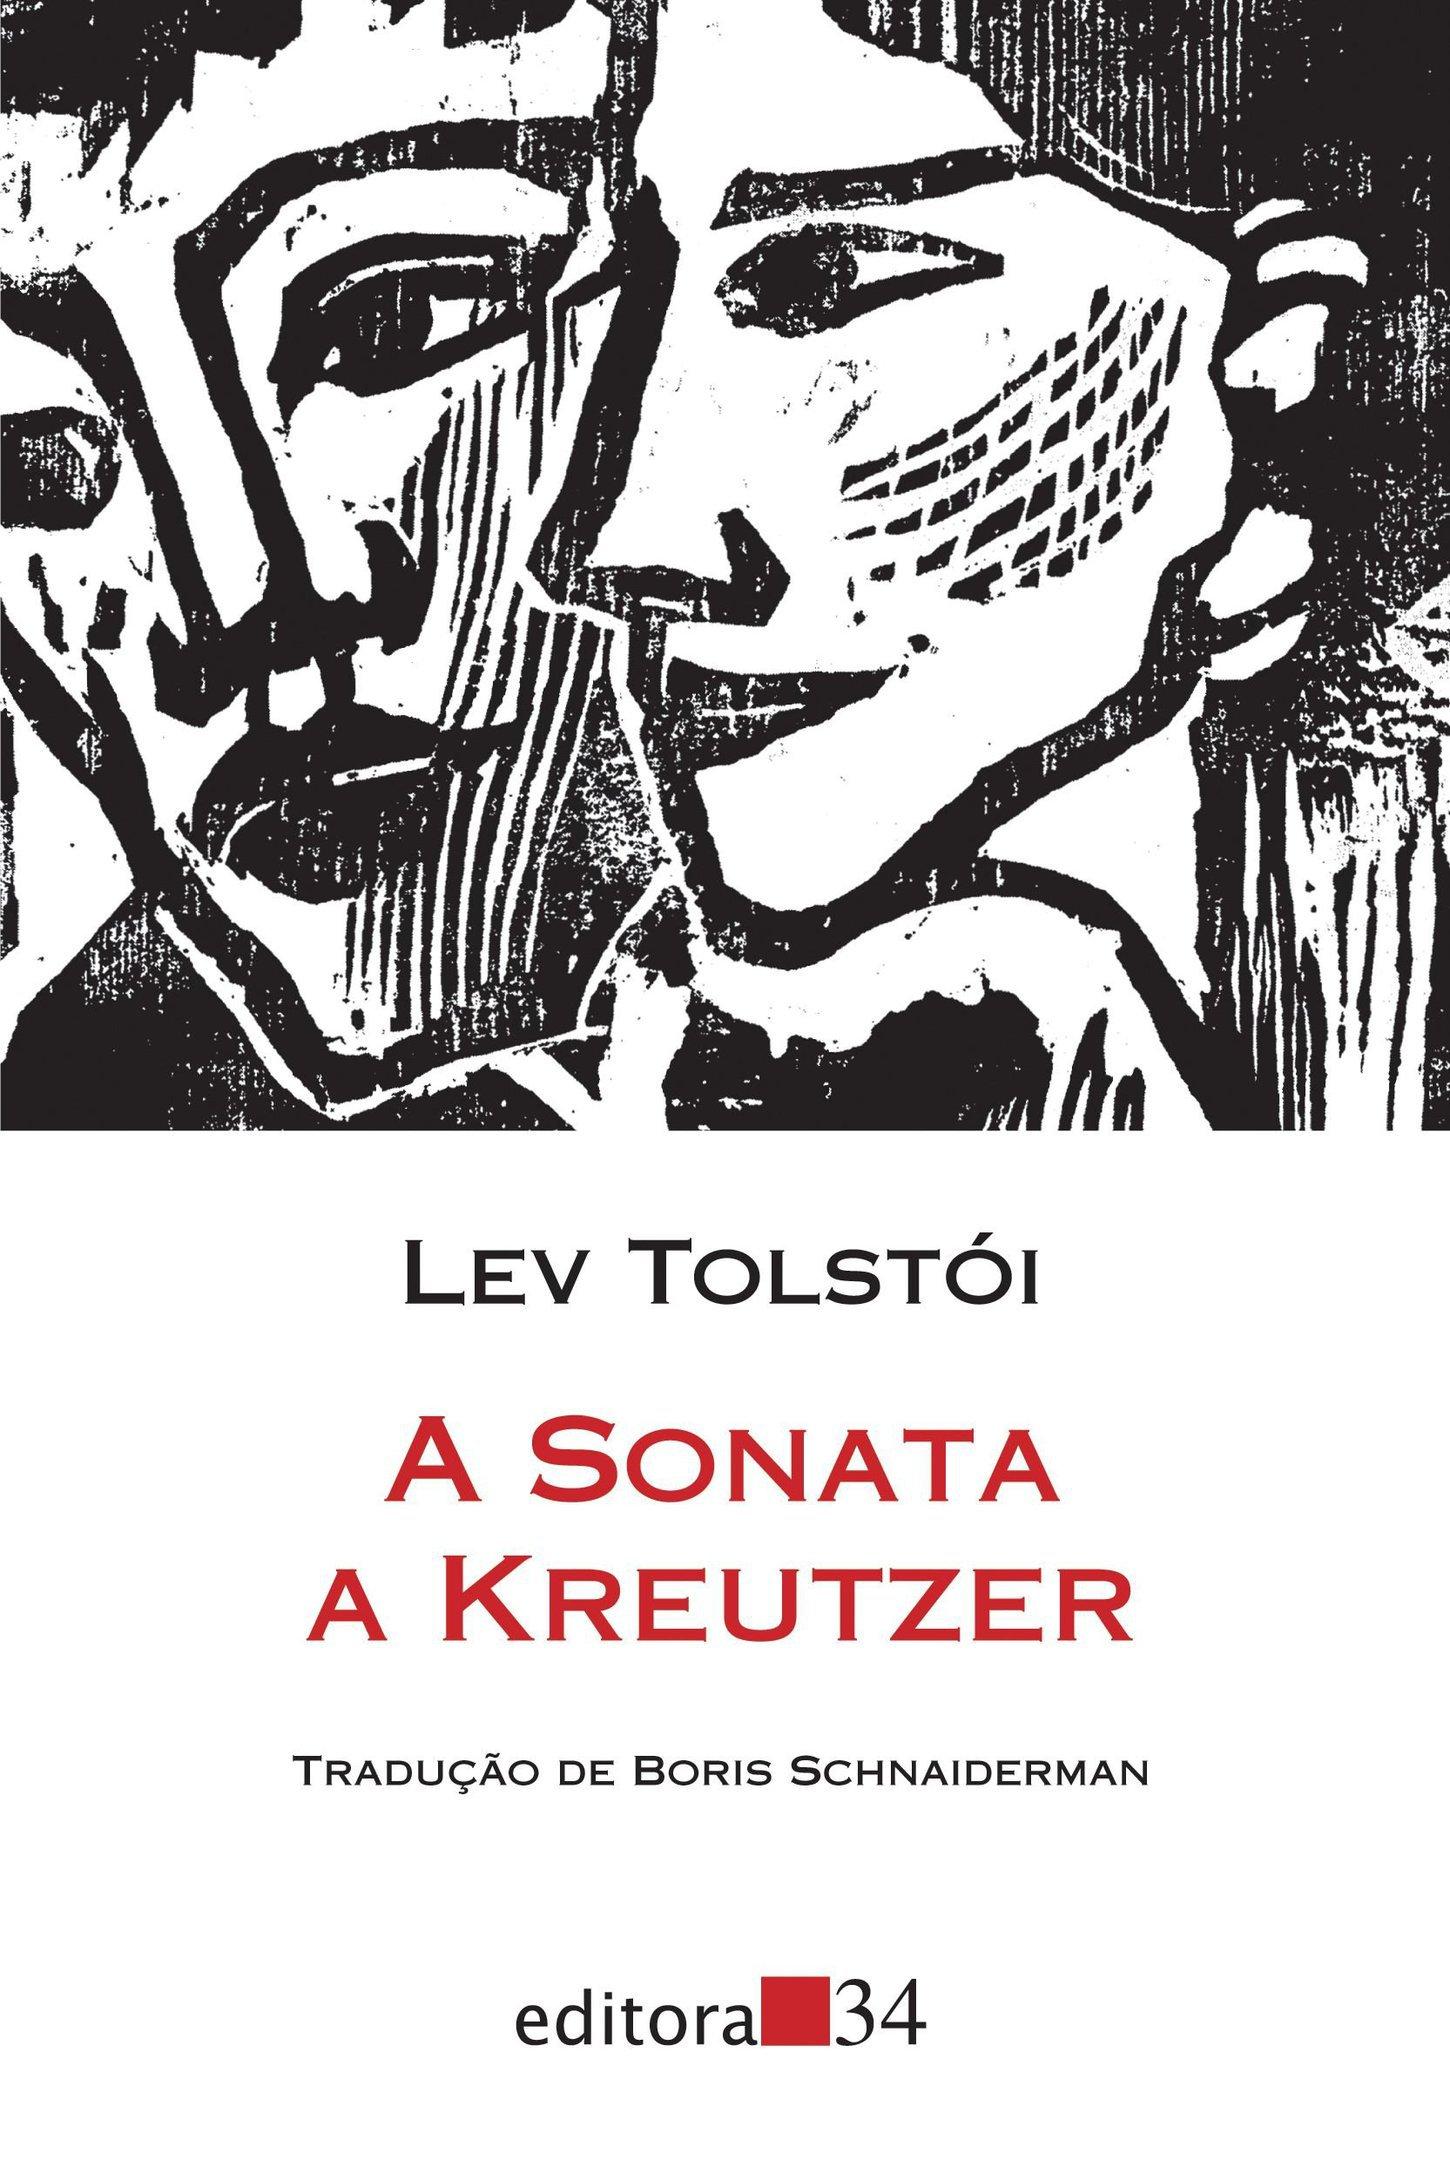 A Sonata a Kreutzer, de Lev Tolstói